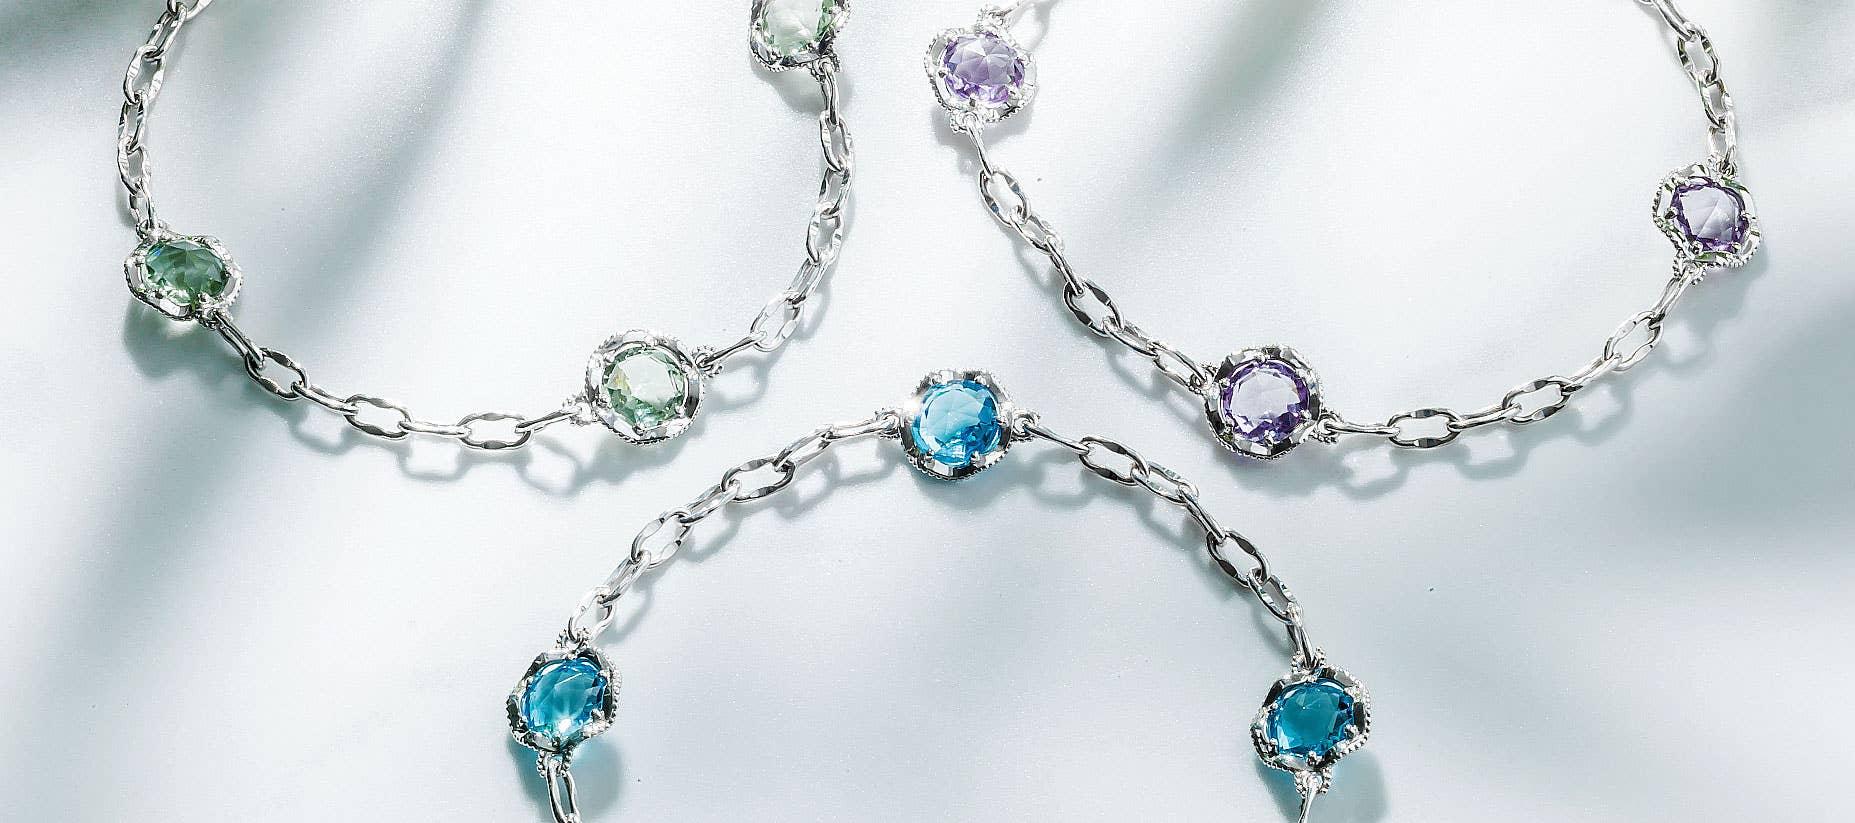 Three Tacori bracelets with multiple gemstones